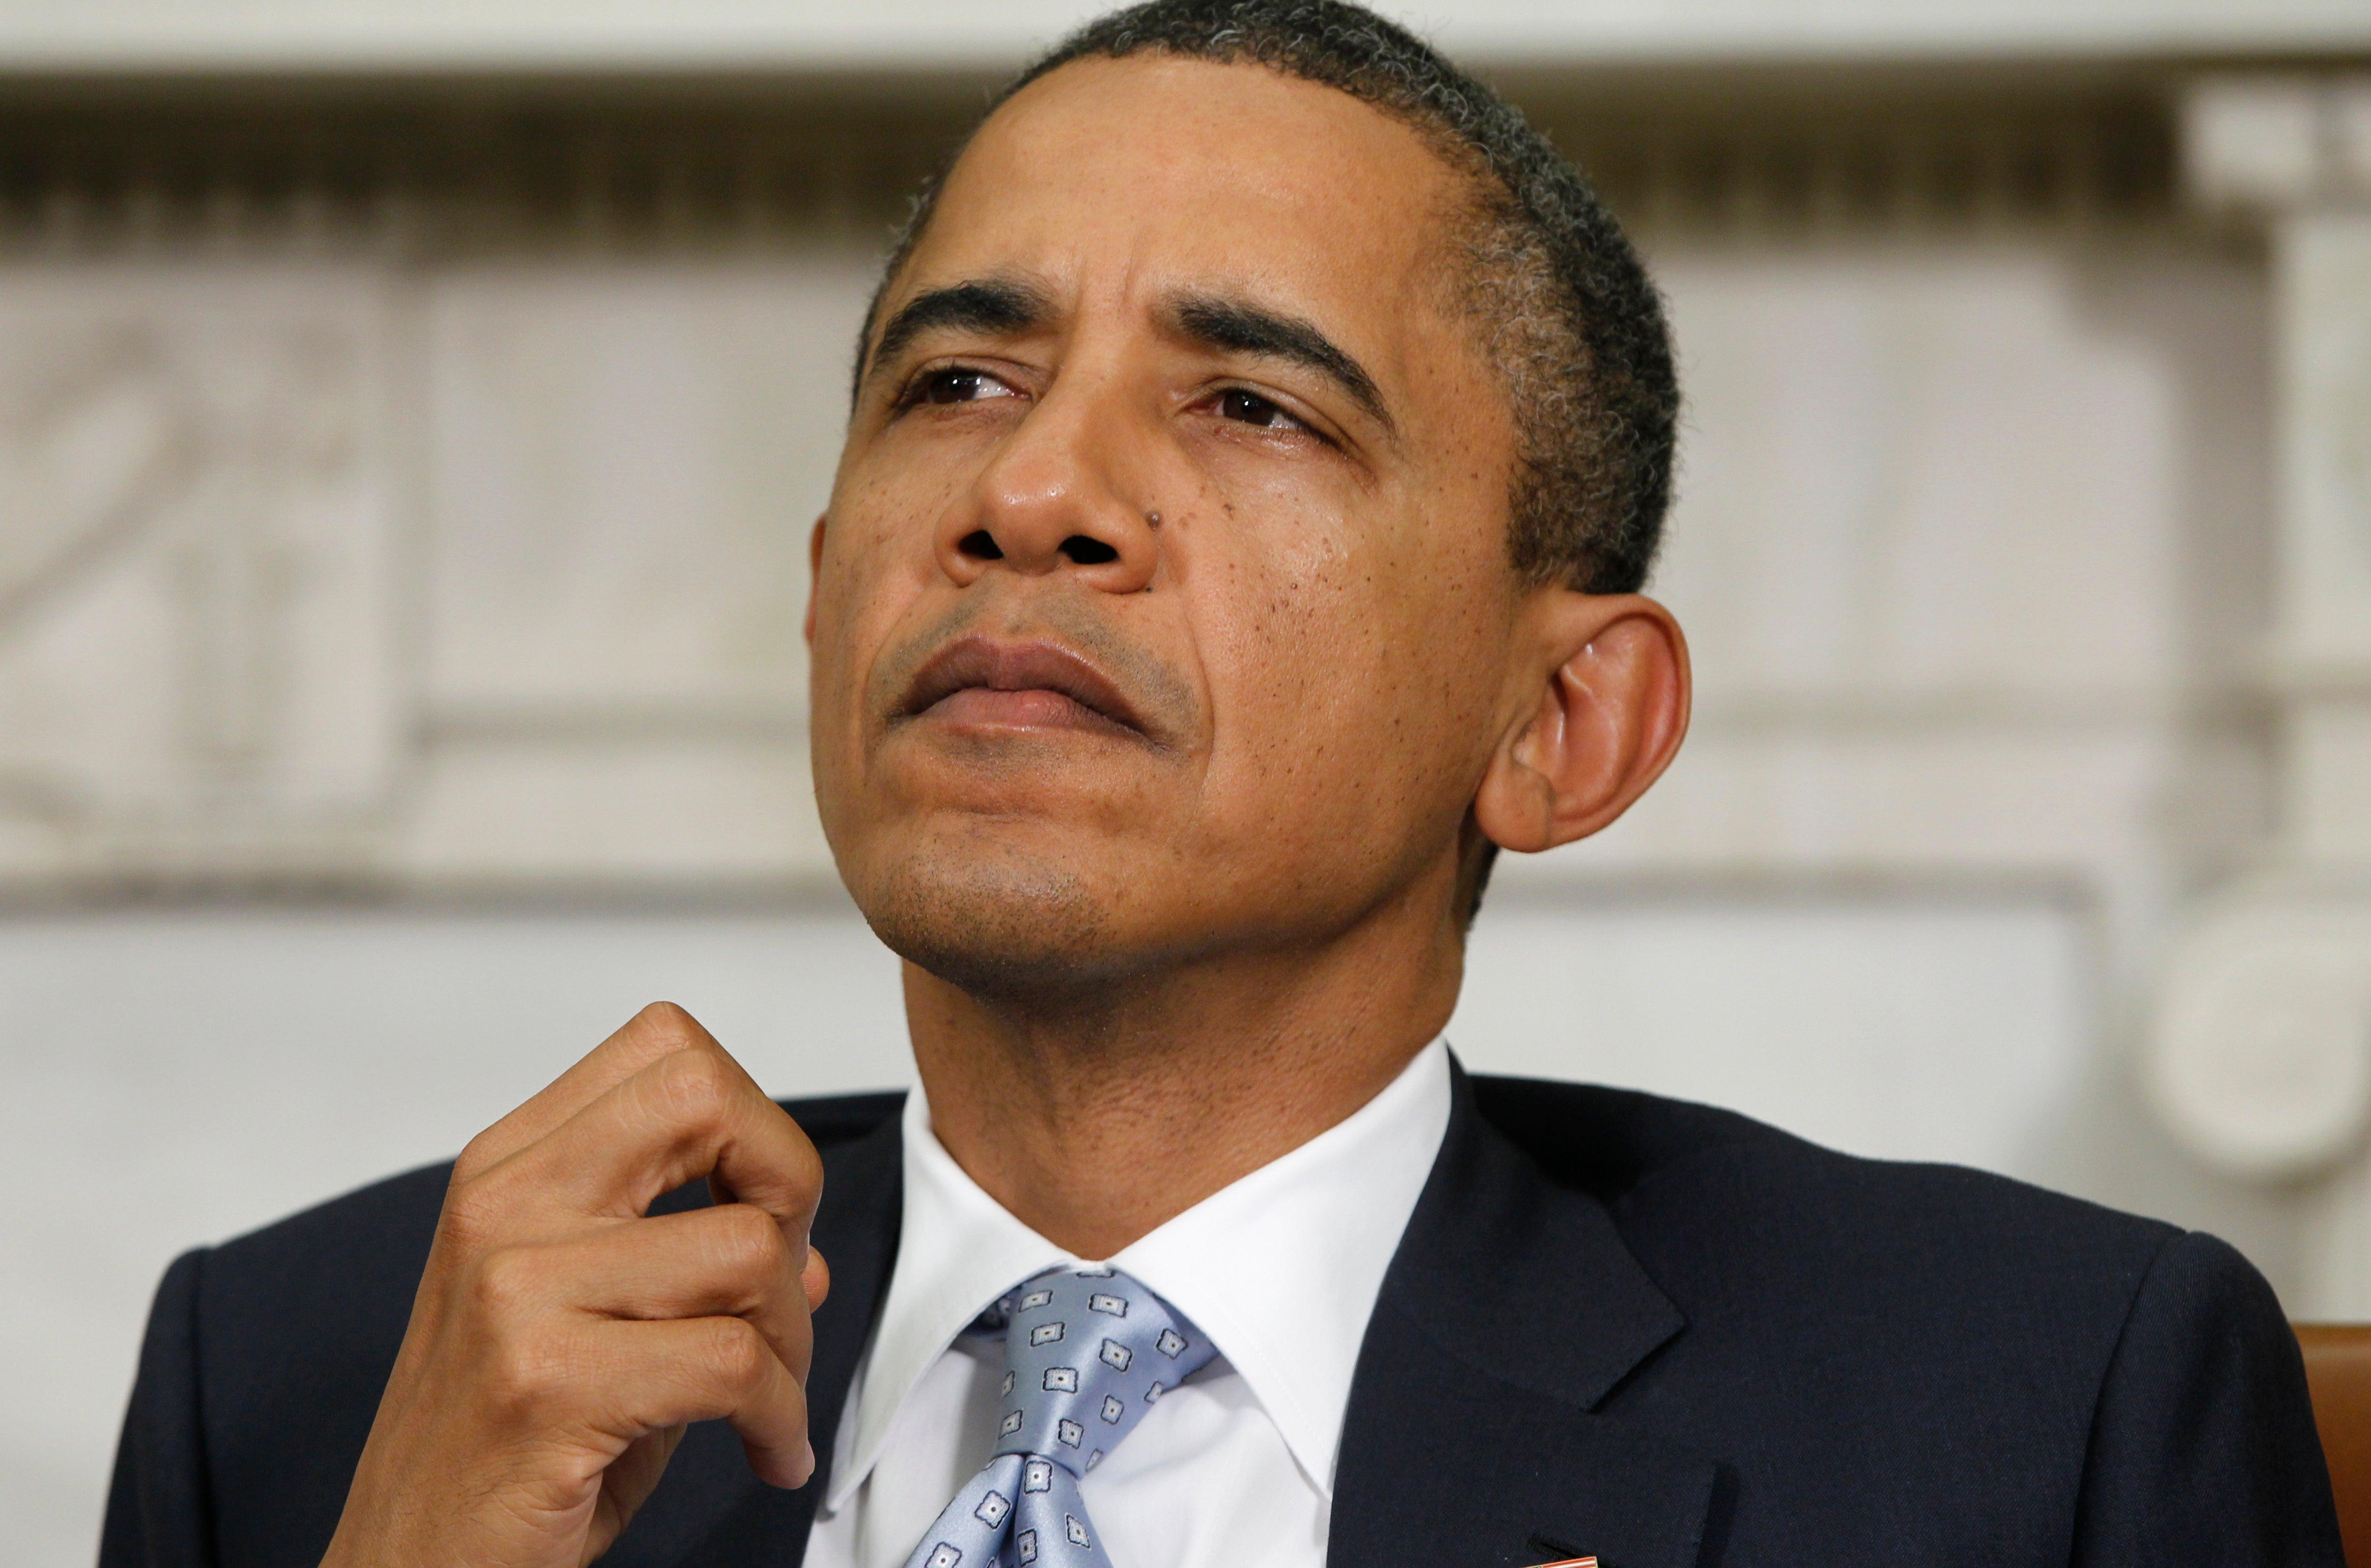 President Obama Praying for the Houston Family